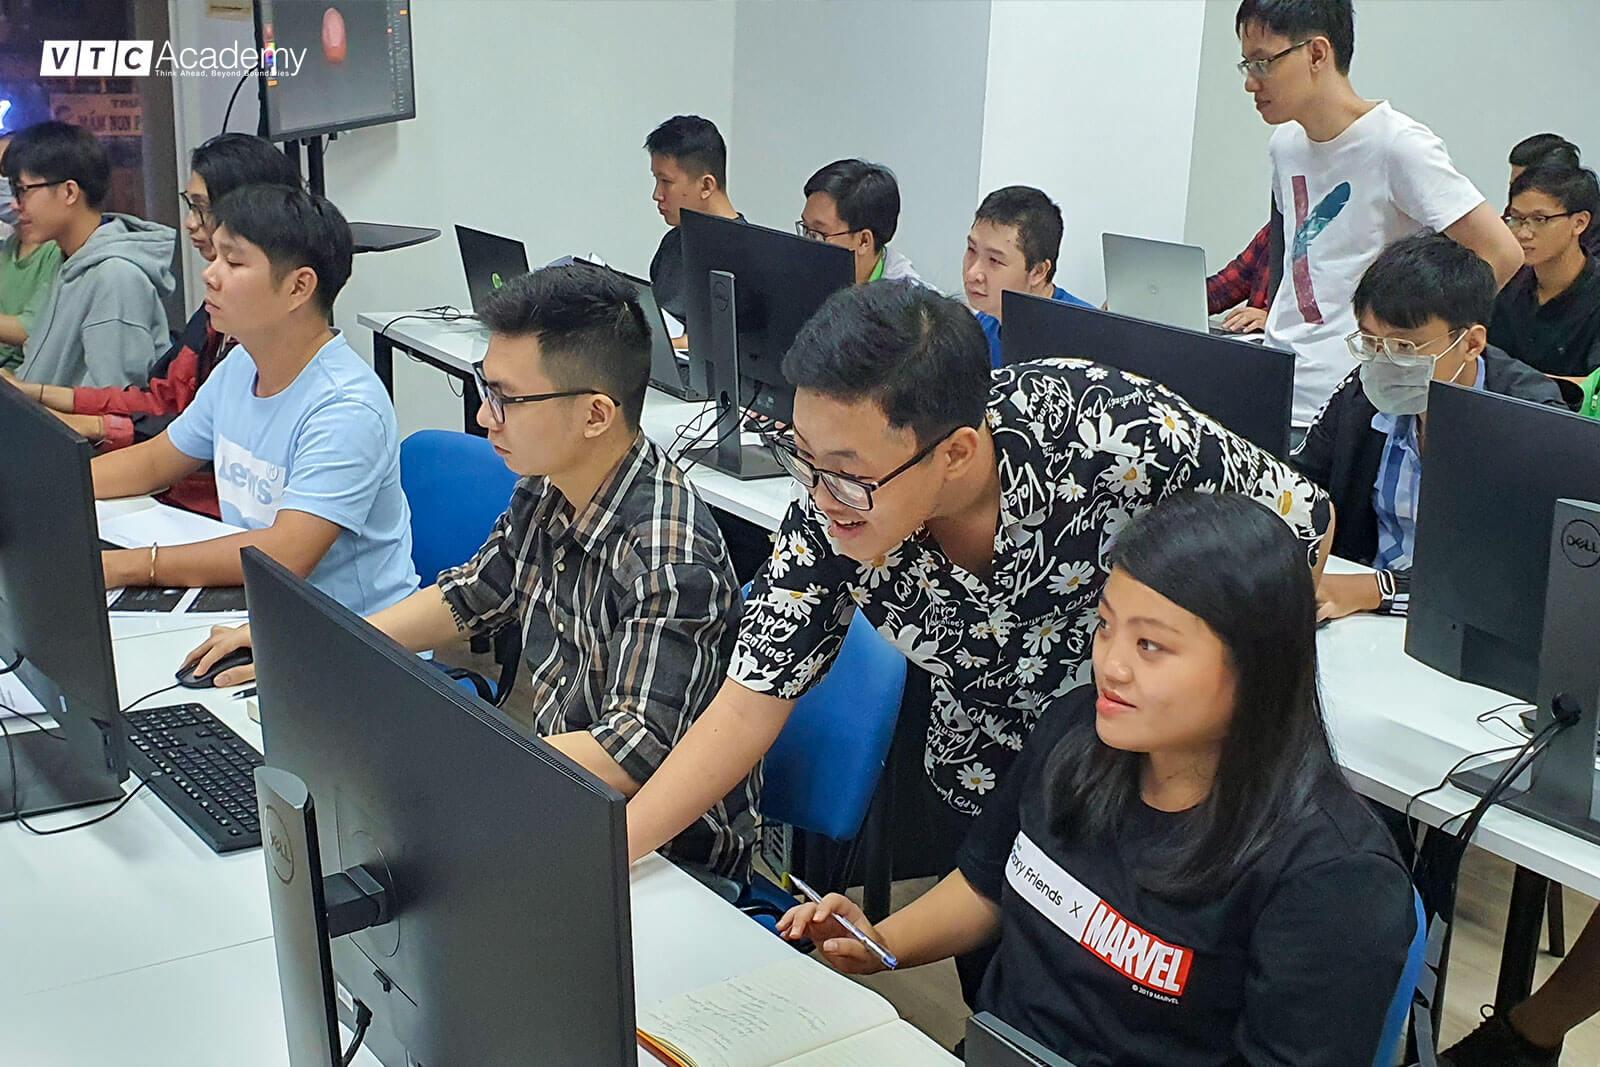 3d-modeling-bootcamp-vtc-academy-4